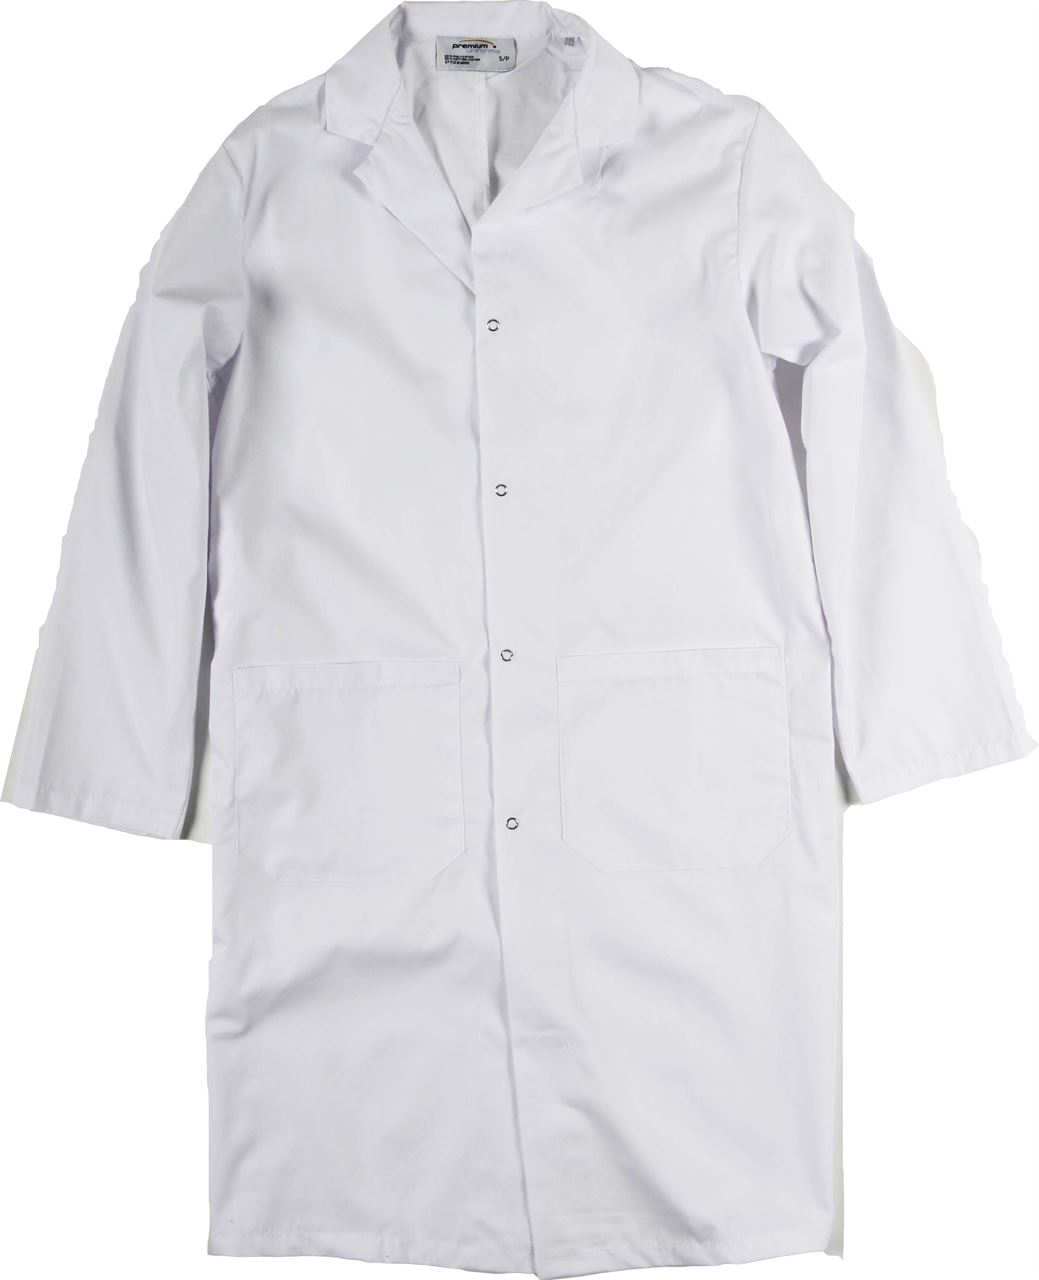 Men's Lab Coat With Pockets | Custom Lab Coats | Work Wear | Entripy